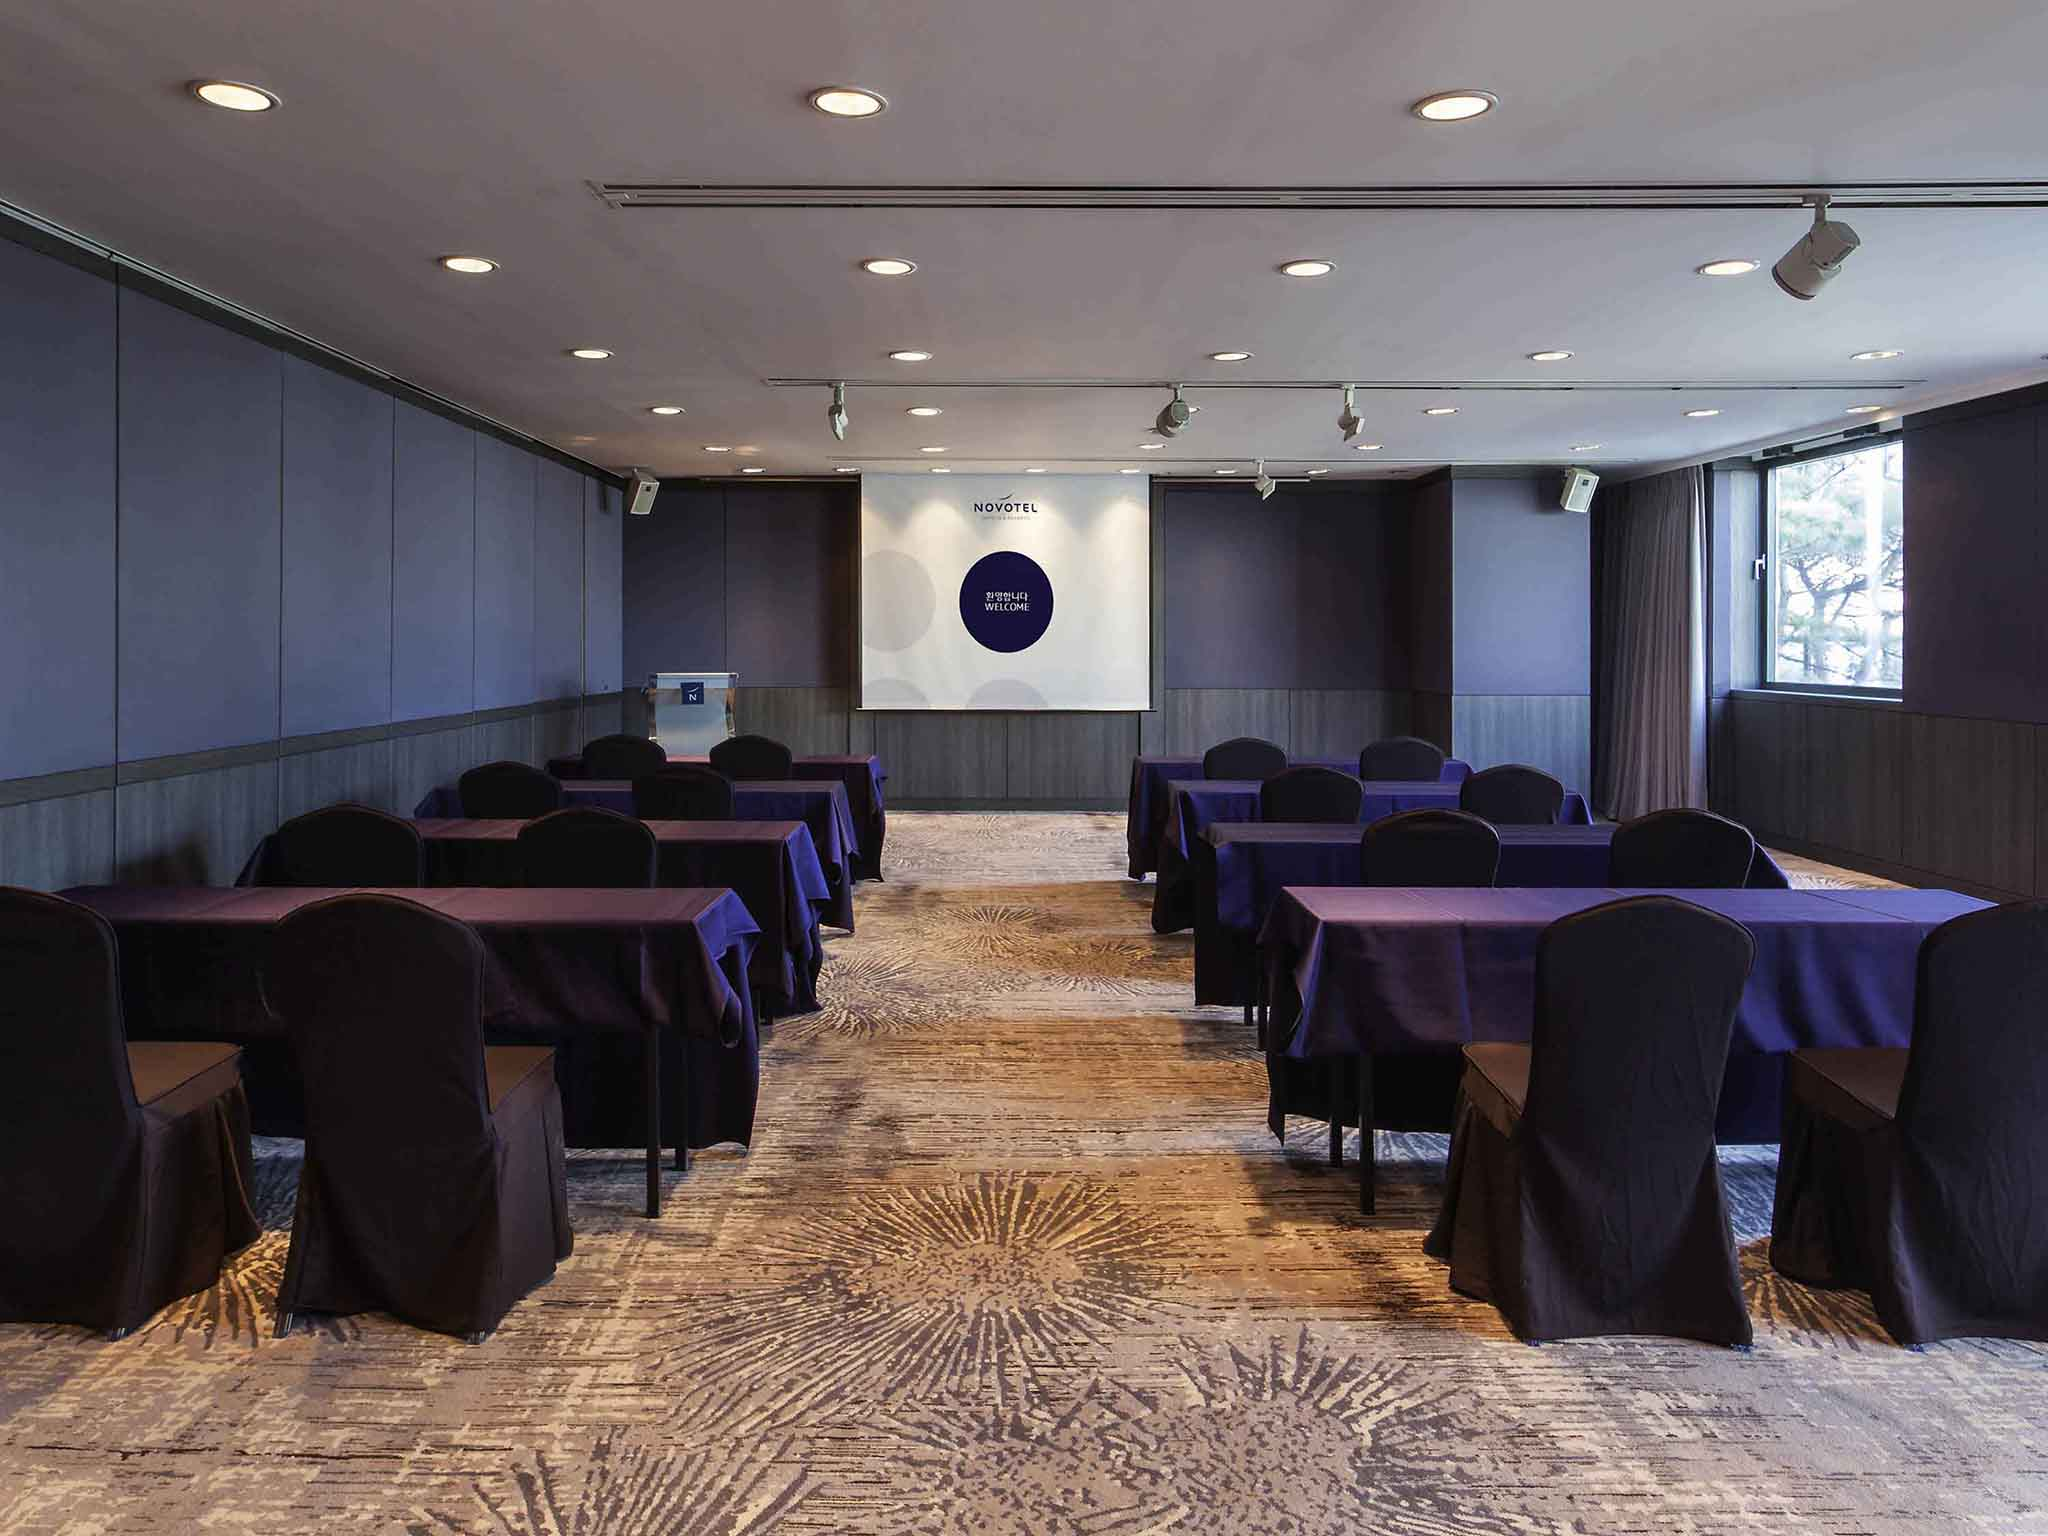 Whirlpool Bad Kwaliteit : Hotel in seoul novotel ambassador seoul doksan